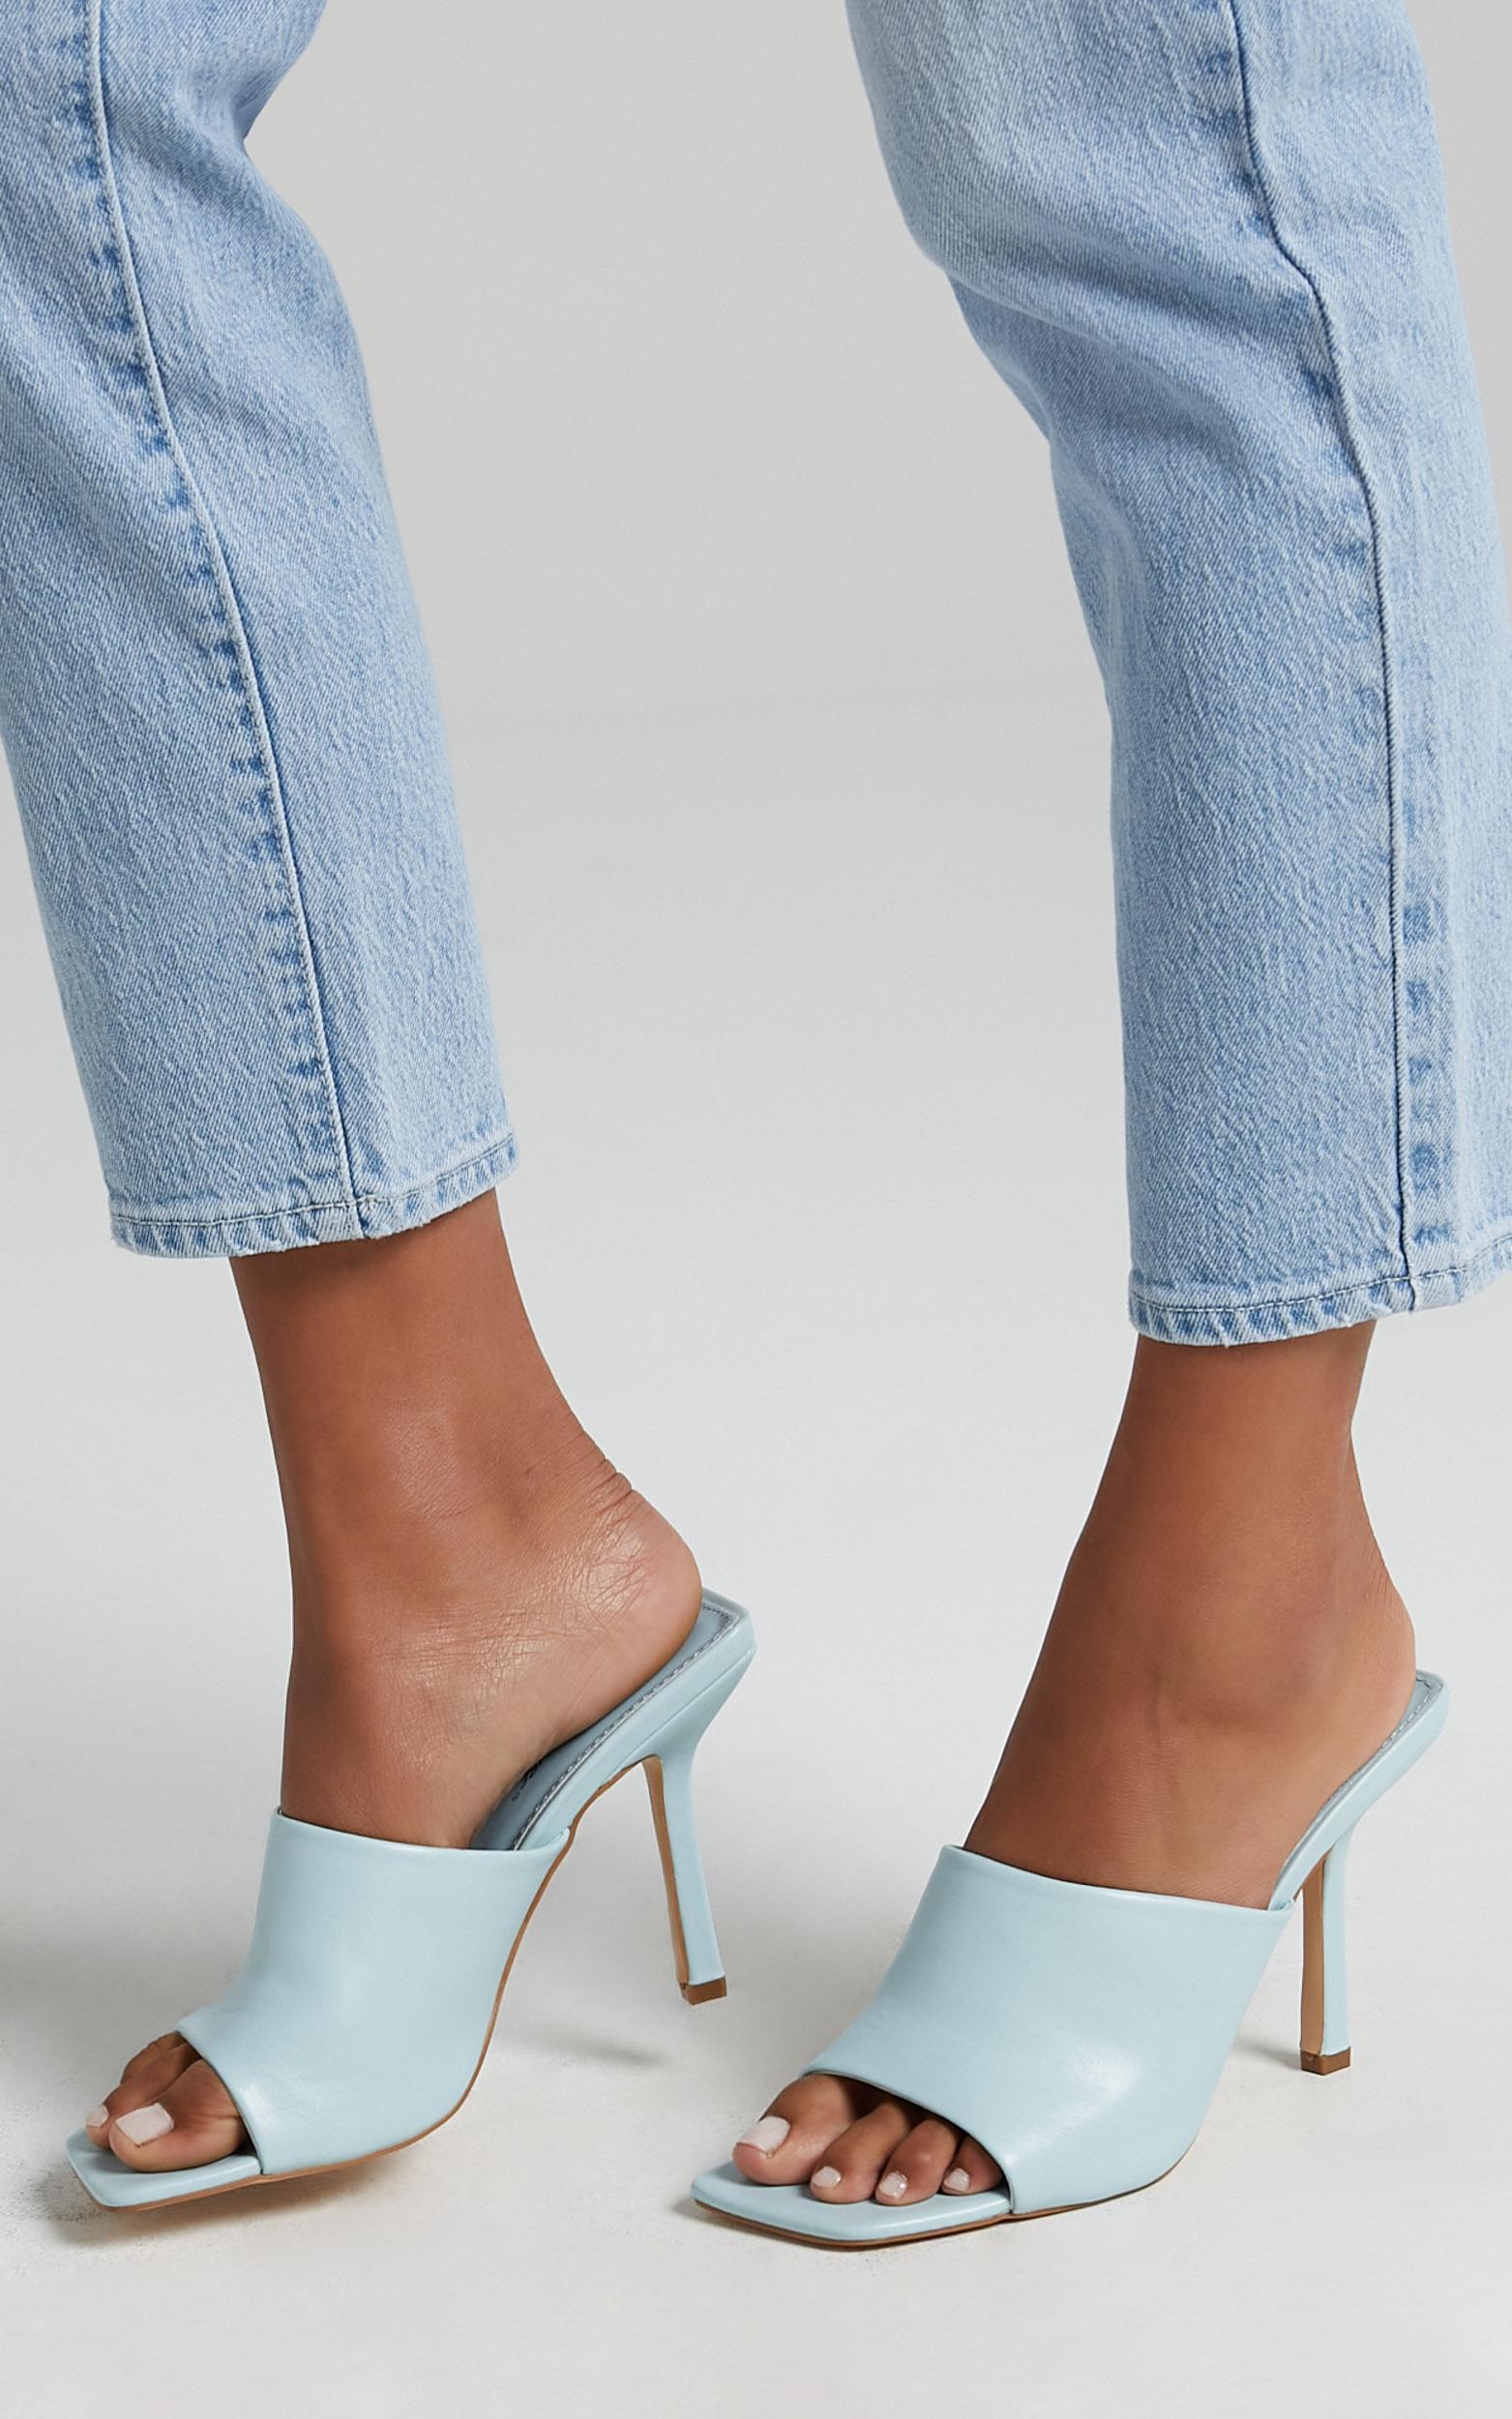 Public Desire - Zavia Heels in Blue PU - 05, BLU1, hi-res image number null